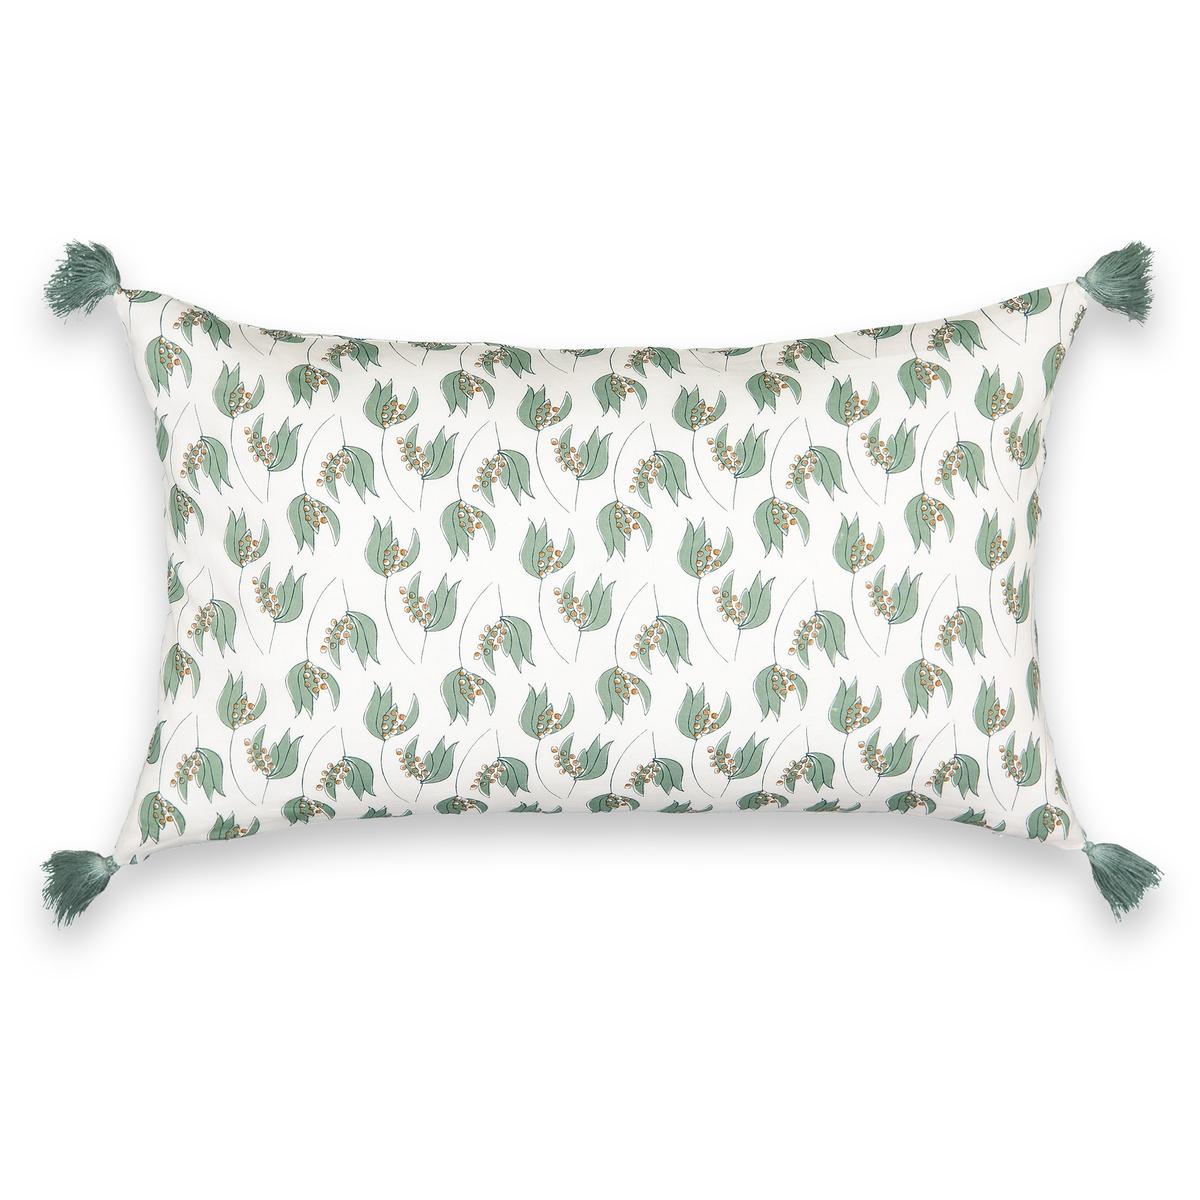 Чехол LaRedoute На подушку LENITA 50 x 30 см зеленый